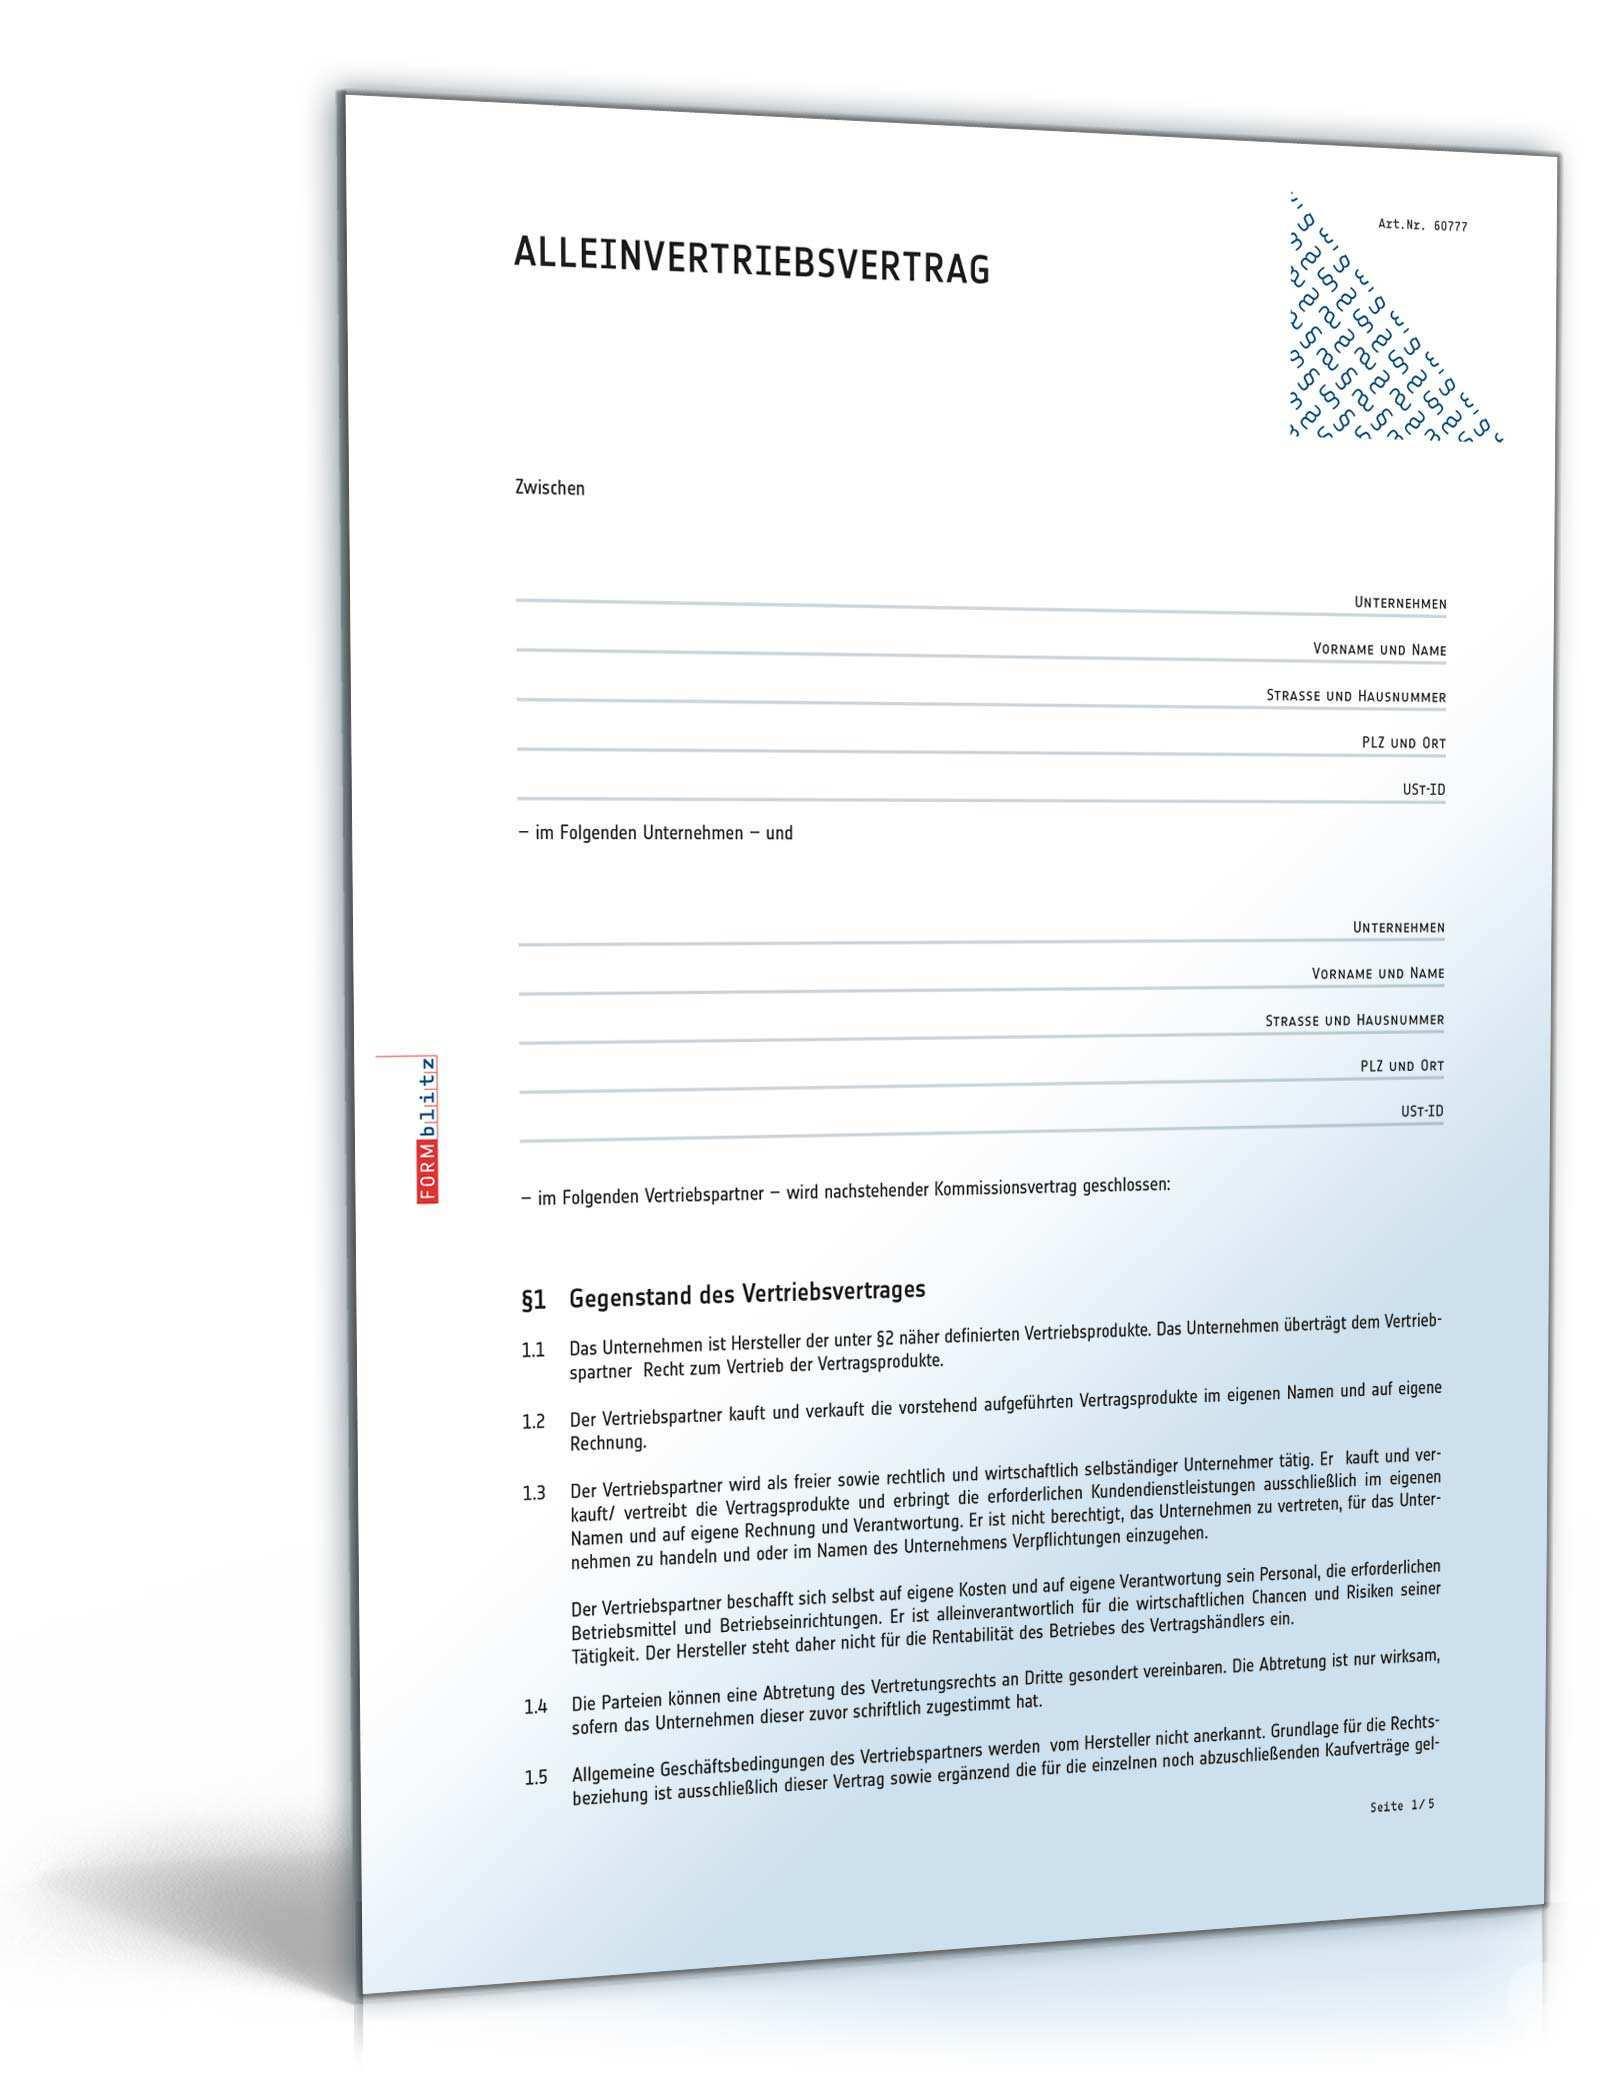 Alleinvertriebsvertrag Rechtssicheres Muster Zum Downloadd